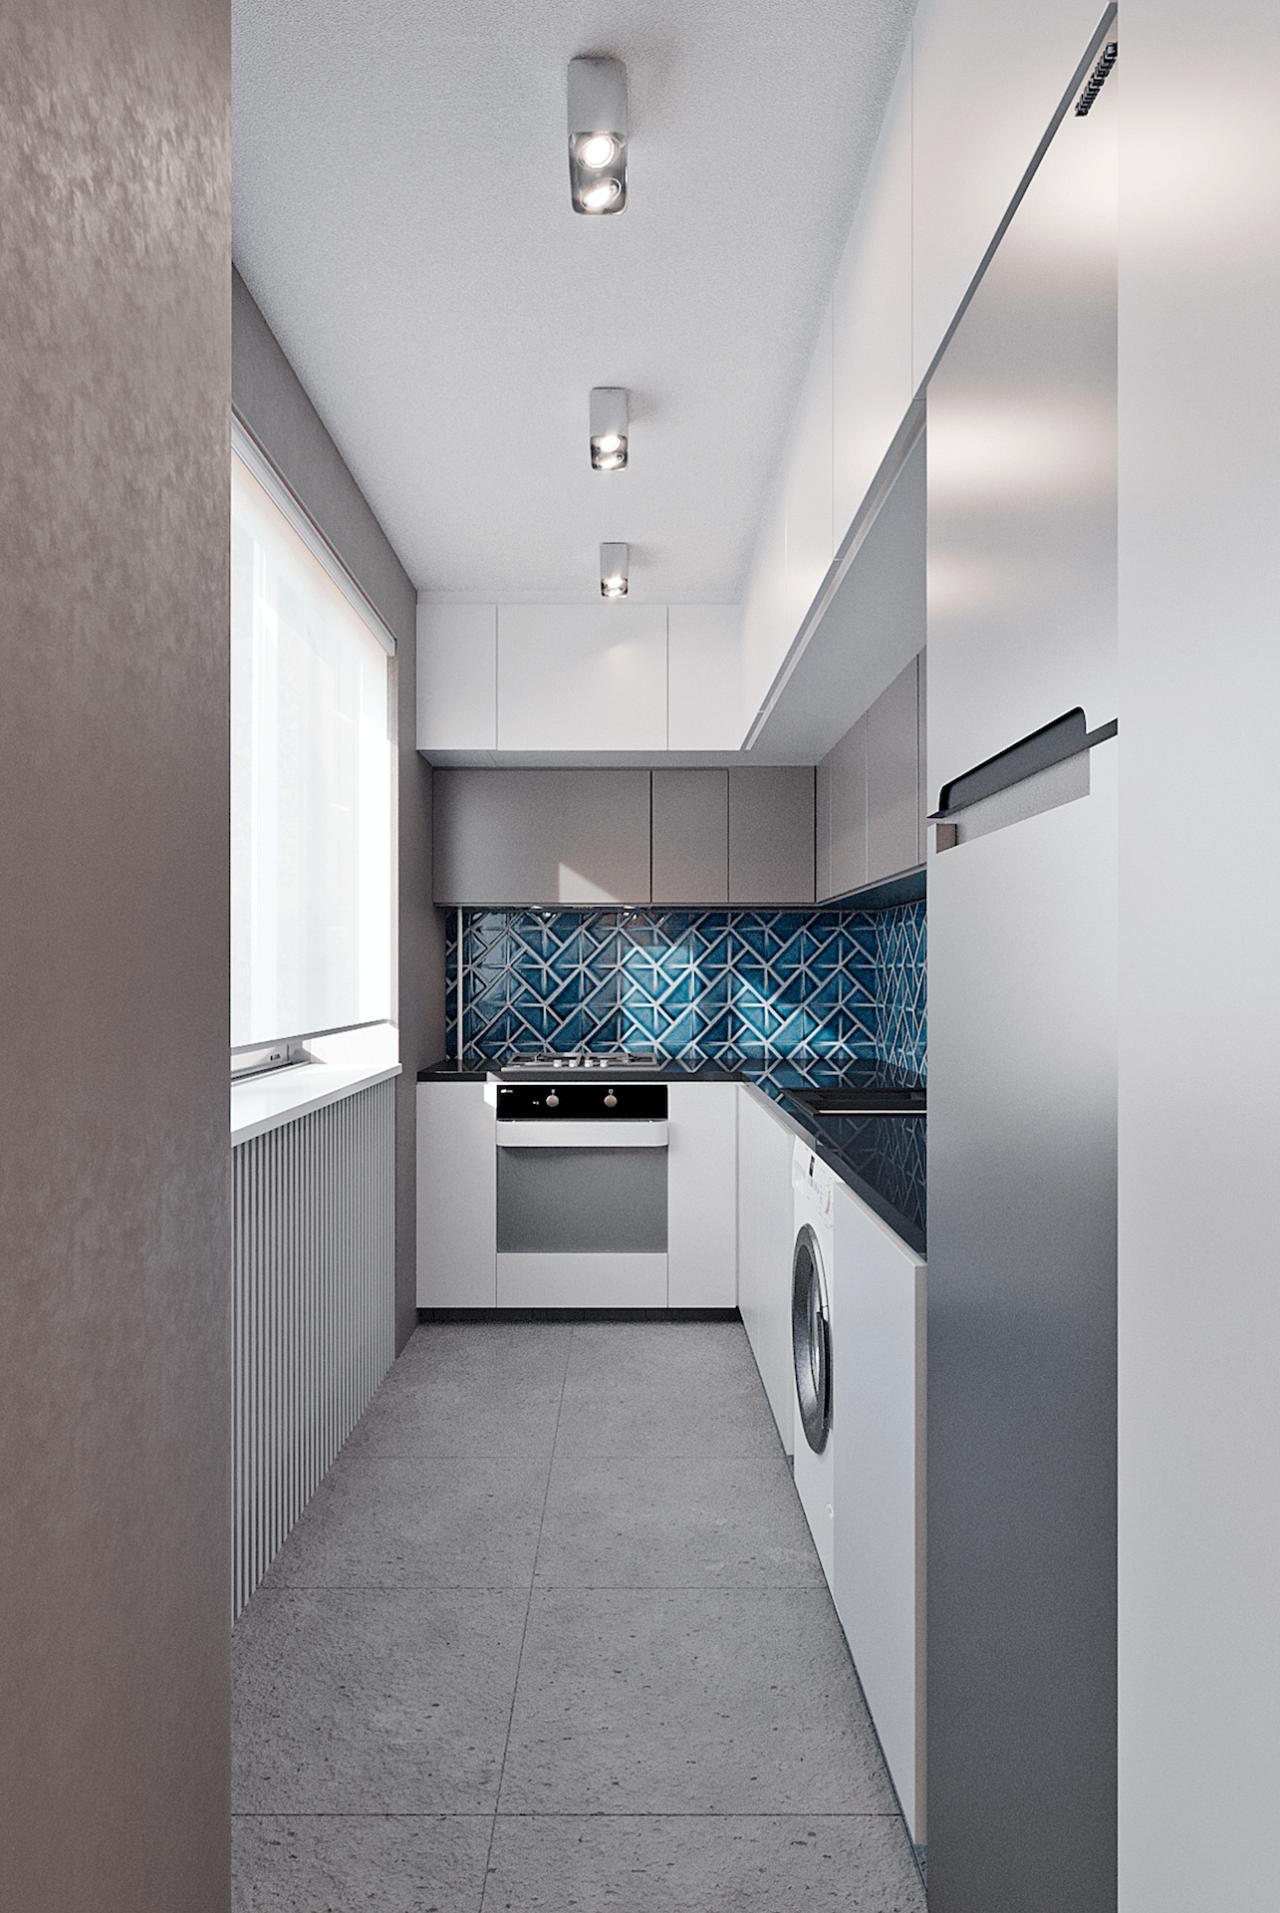 Дизайн проект двухкомнатной квартиры, бирюзовій акцент, Киев | фото 16